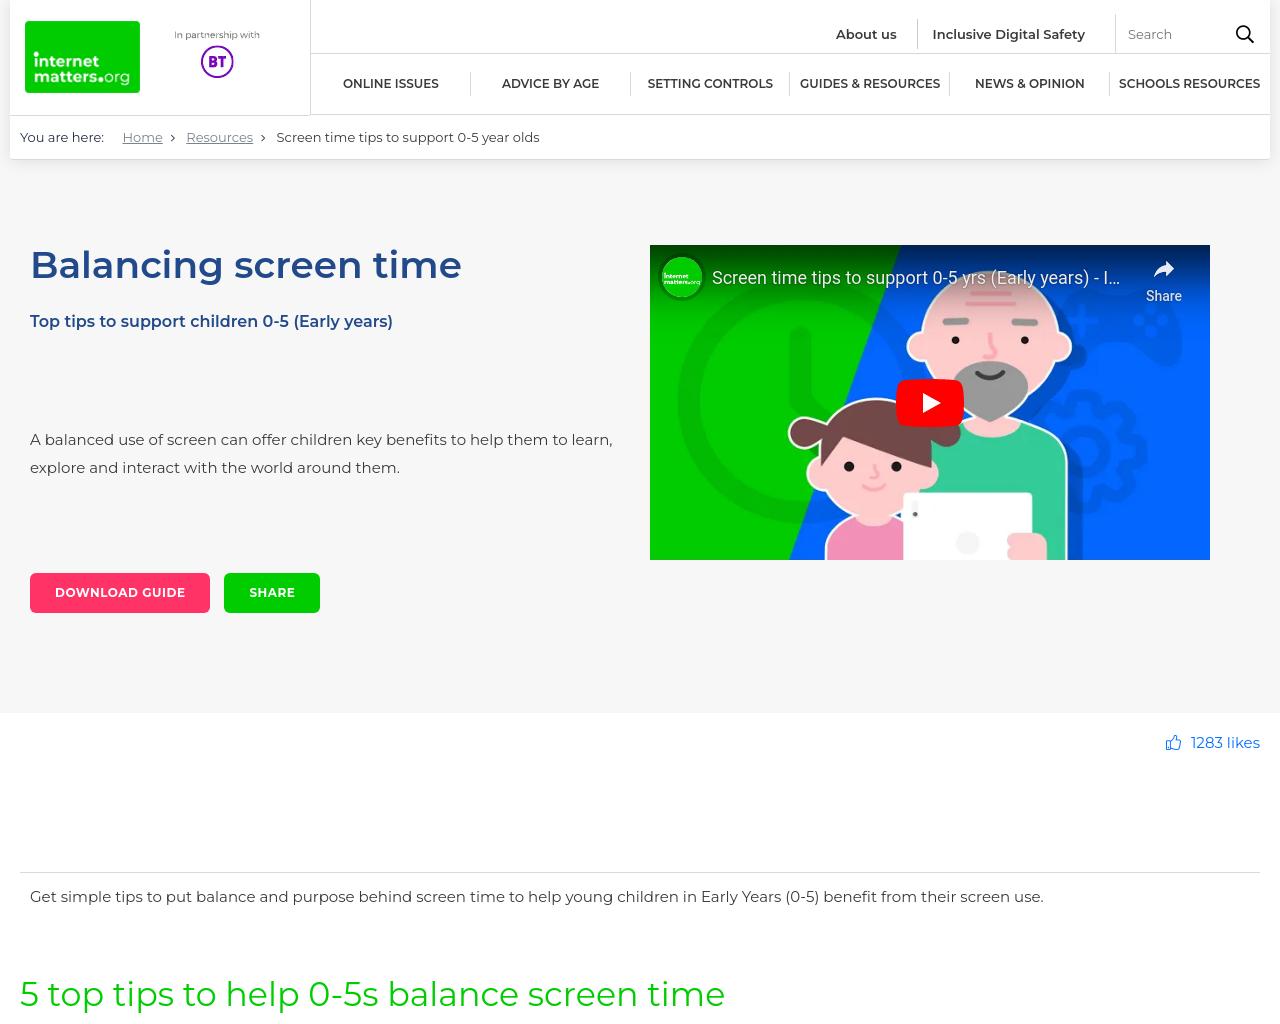 Balancing Screen Time 0-5yr olds